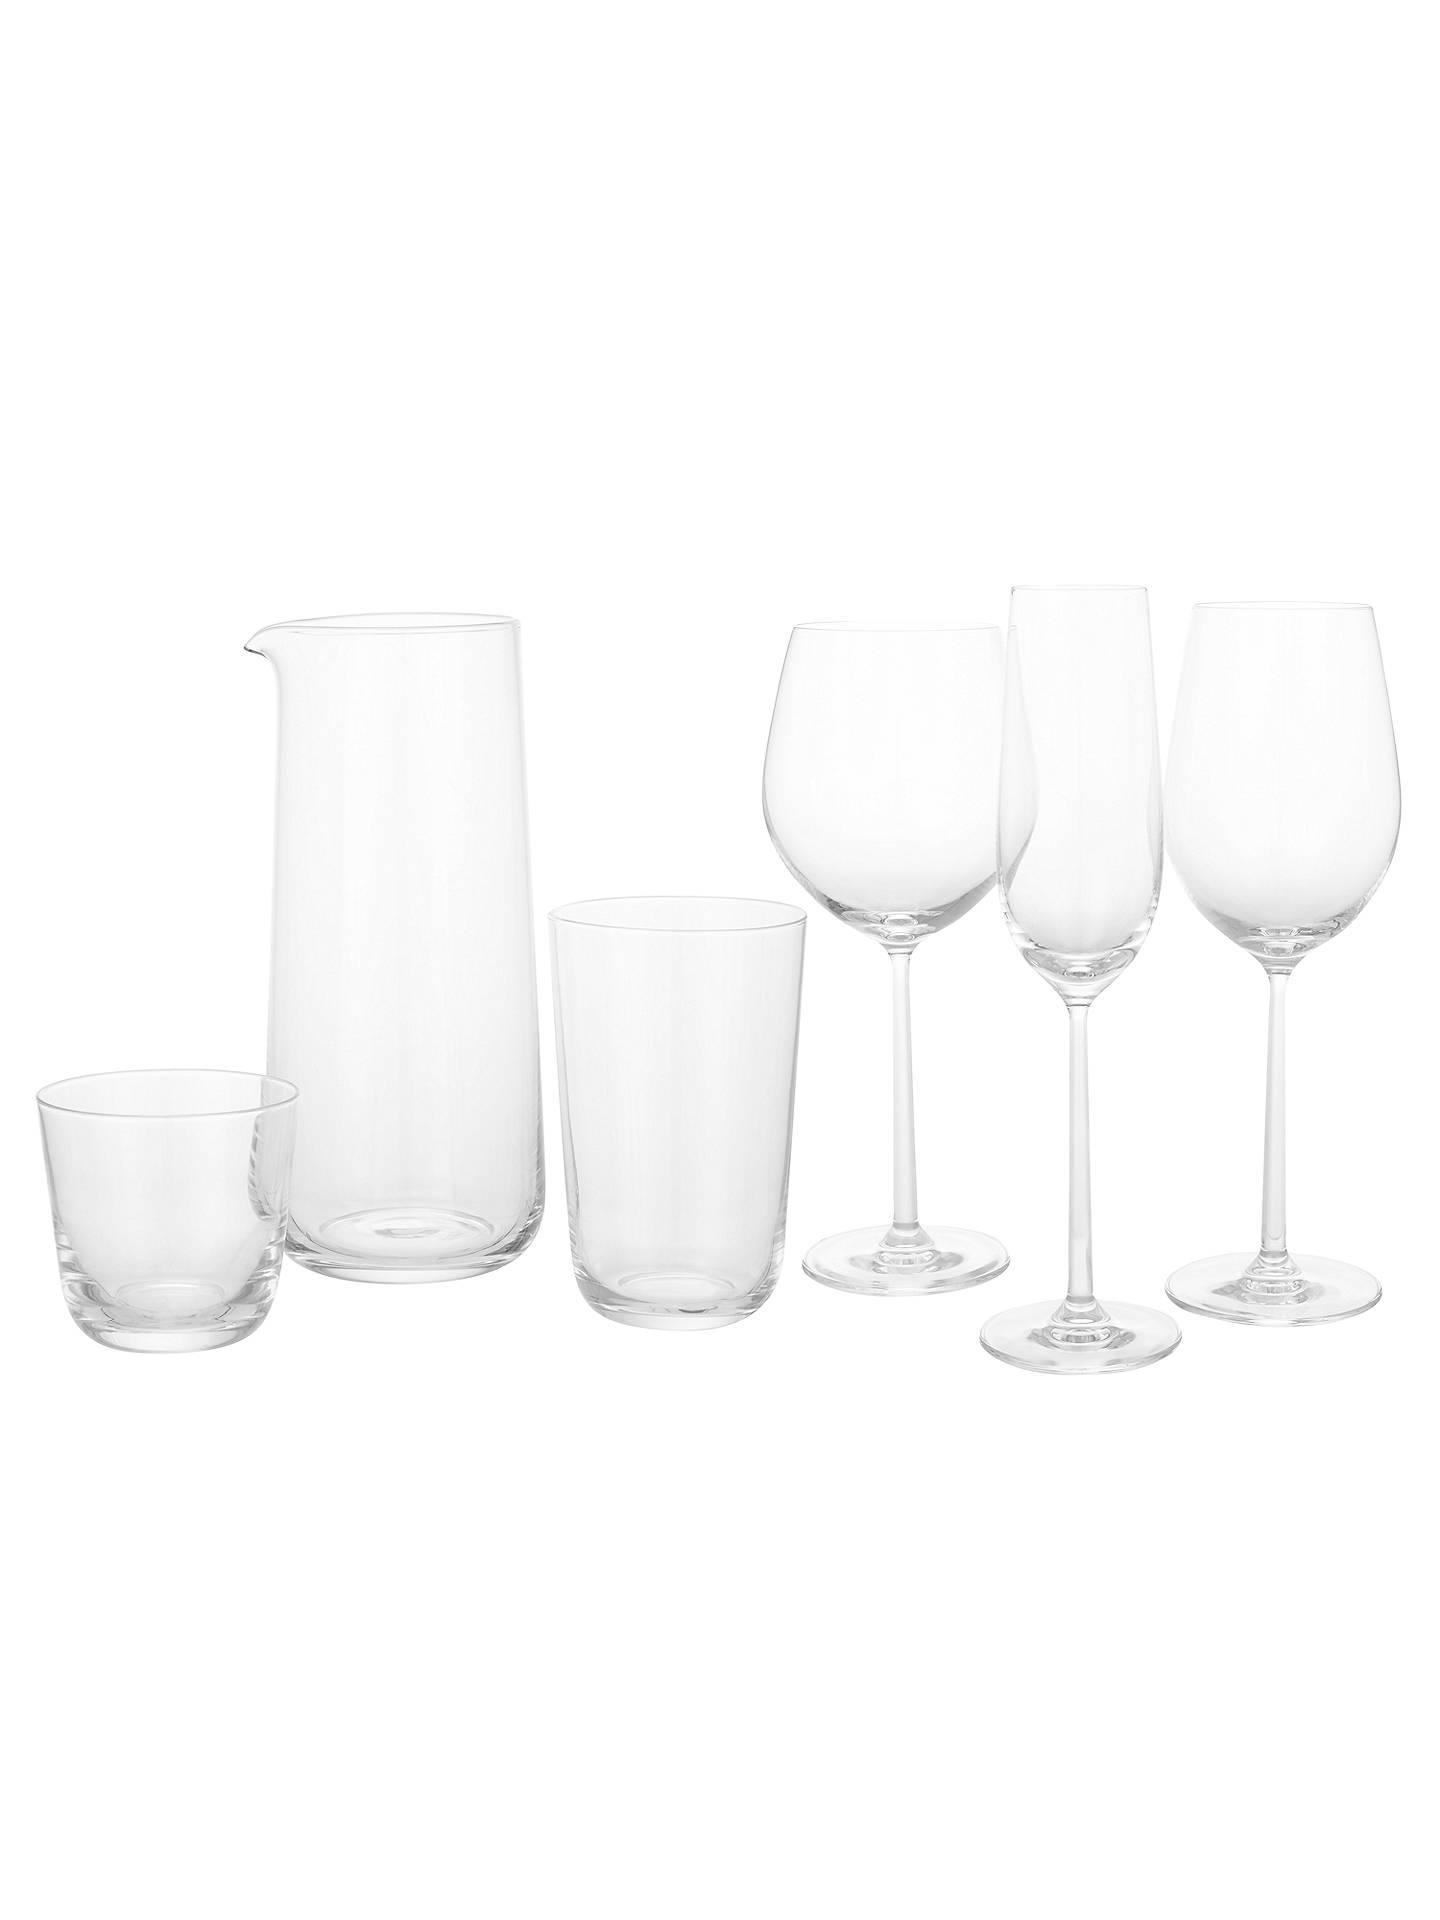 Social By Jason Atherton White Wine Glasses Set Of 4 At